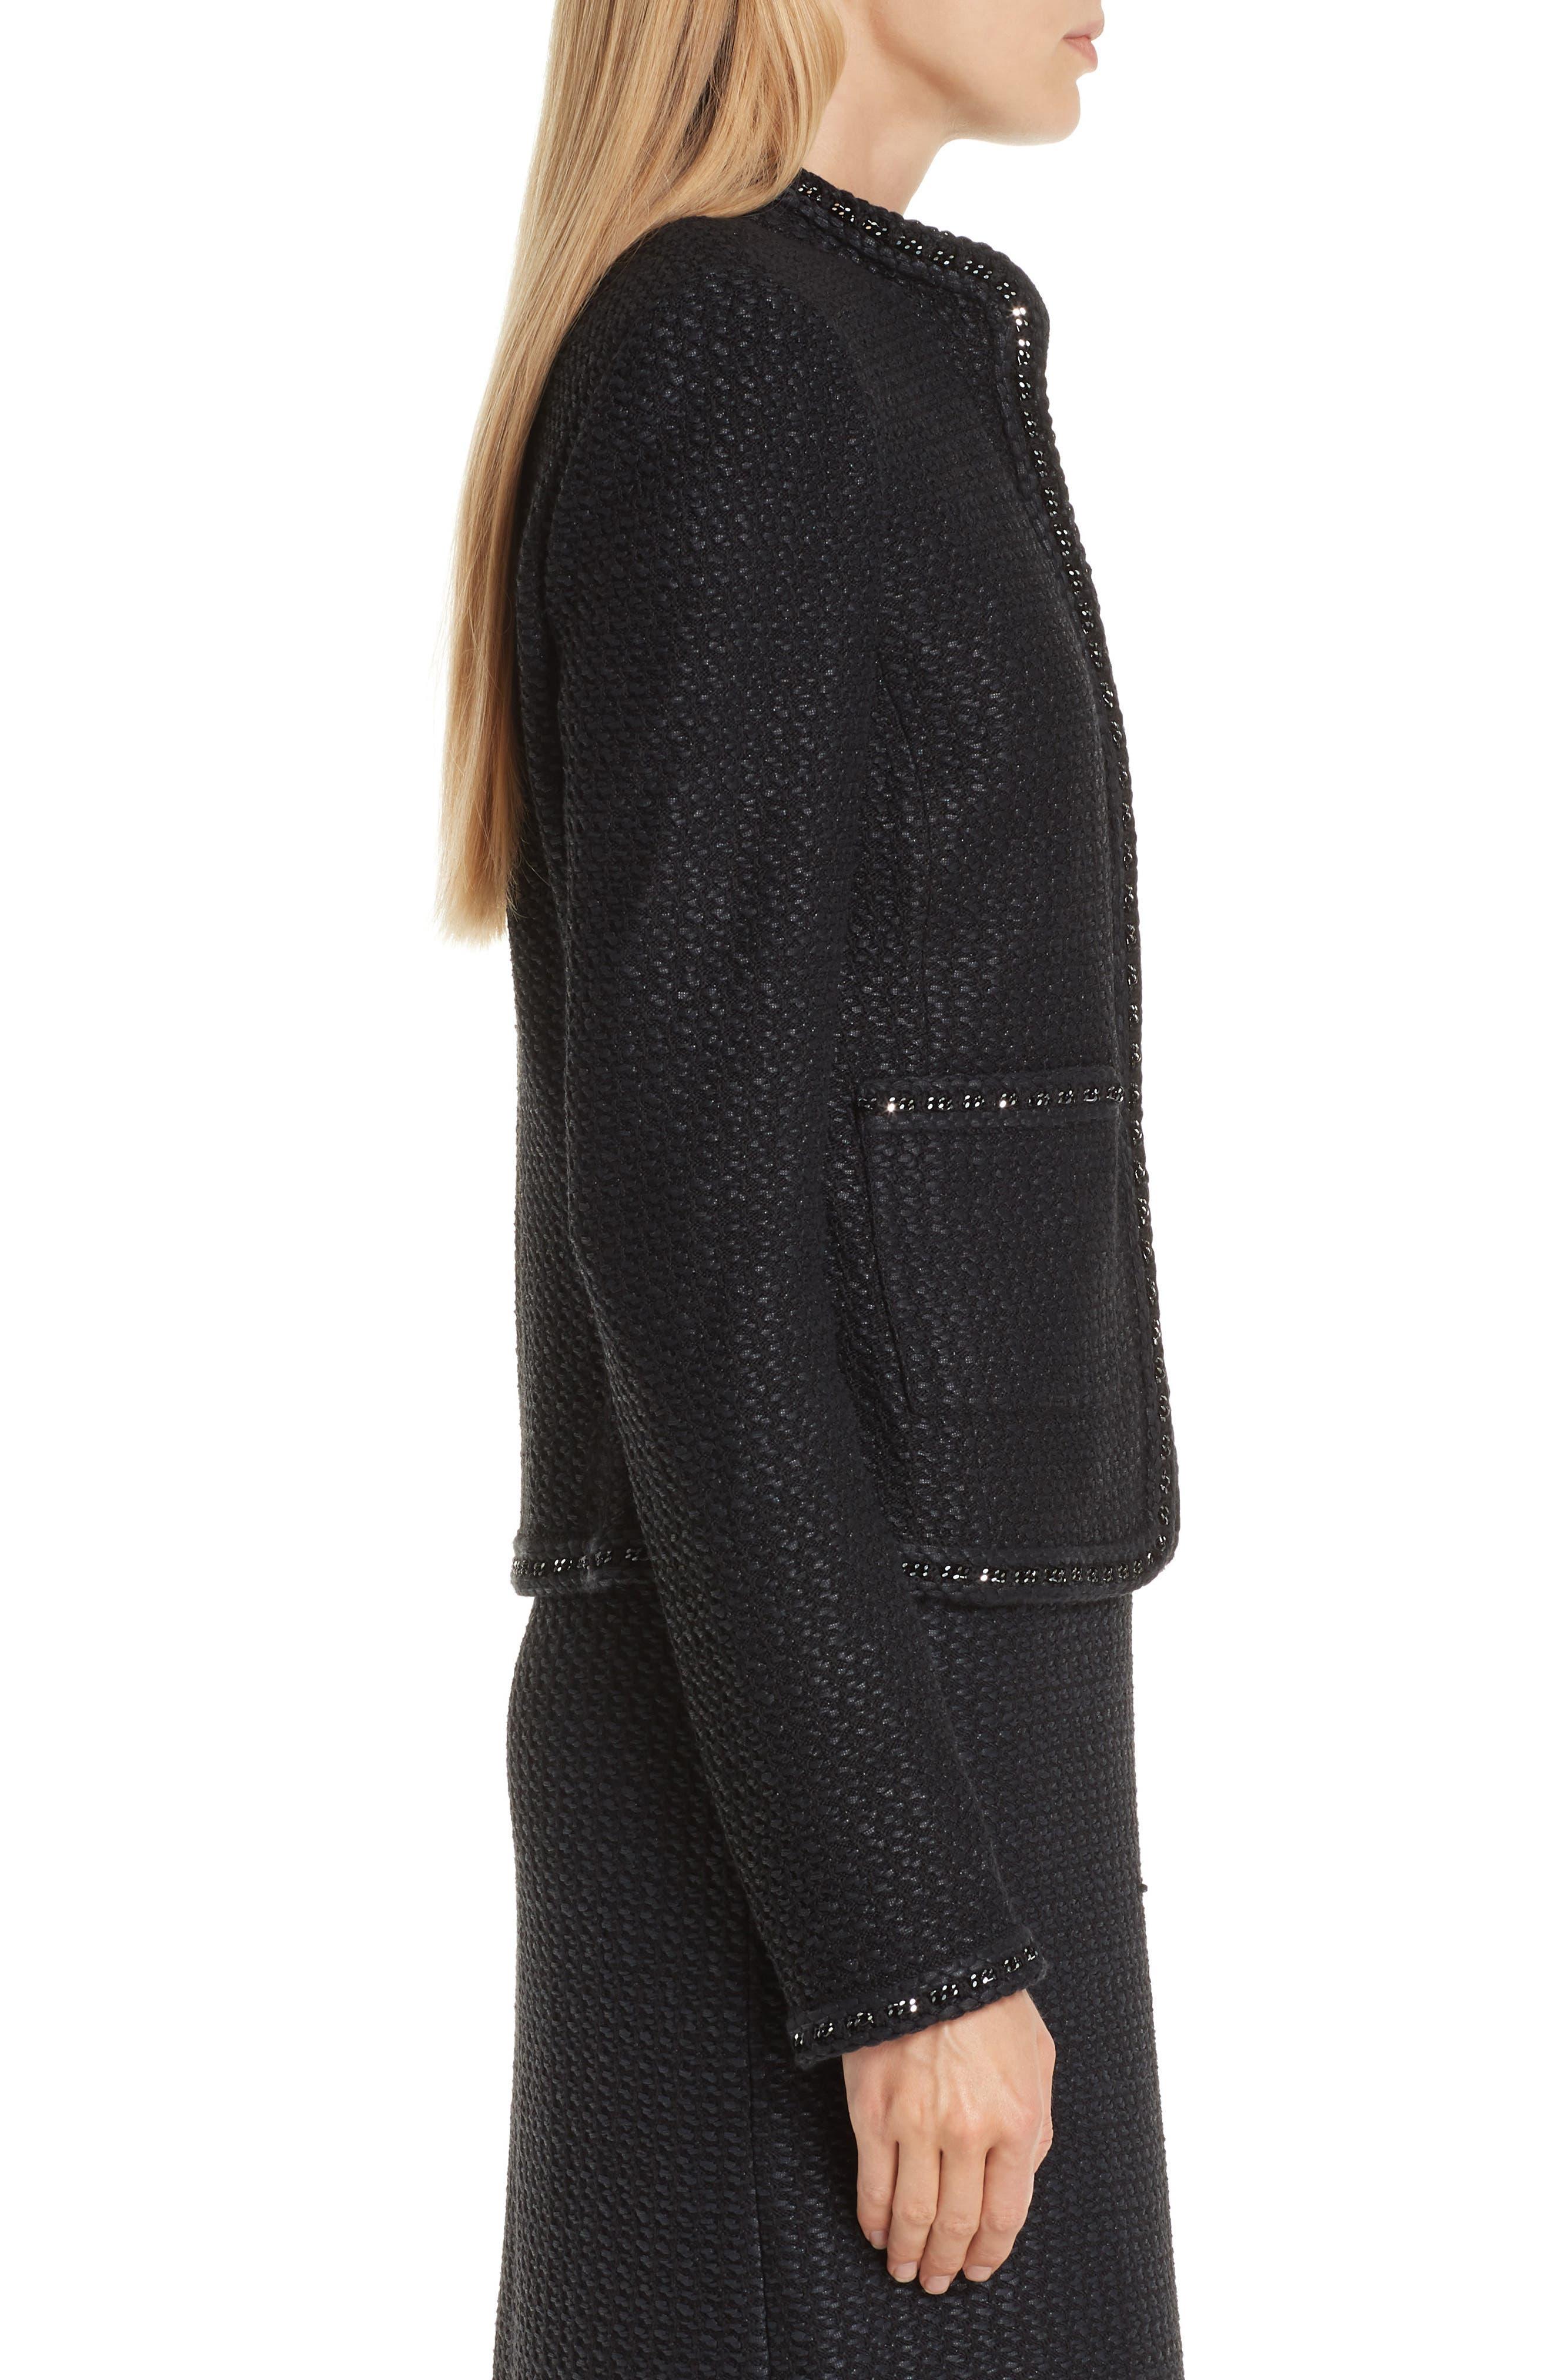 ST. JOHN COLLECTION, Adina Knit Short Jacket, Alternate thumbnail 4, color, CAVIAR